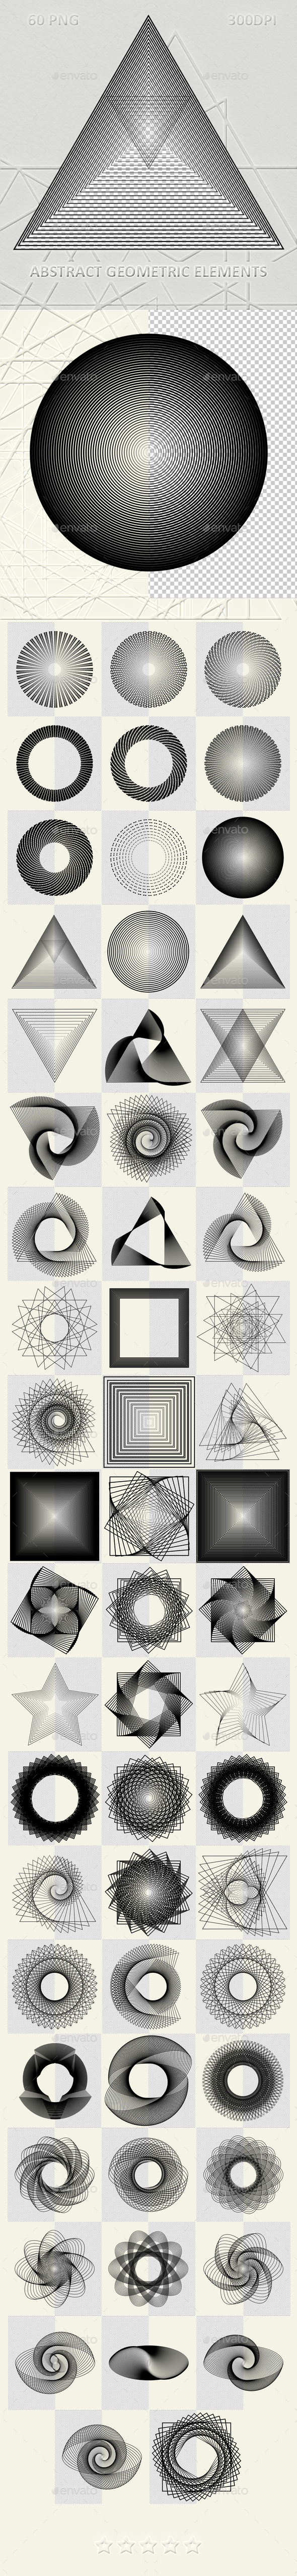 60 Abstract geometric elements - Flourishes / Swirls Decorative